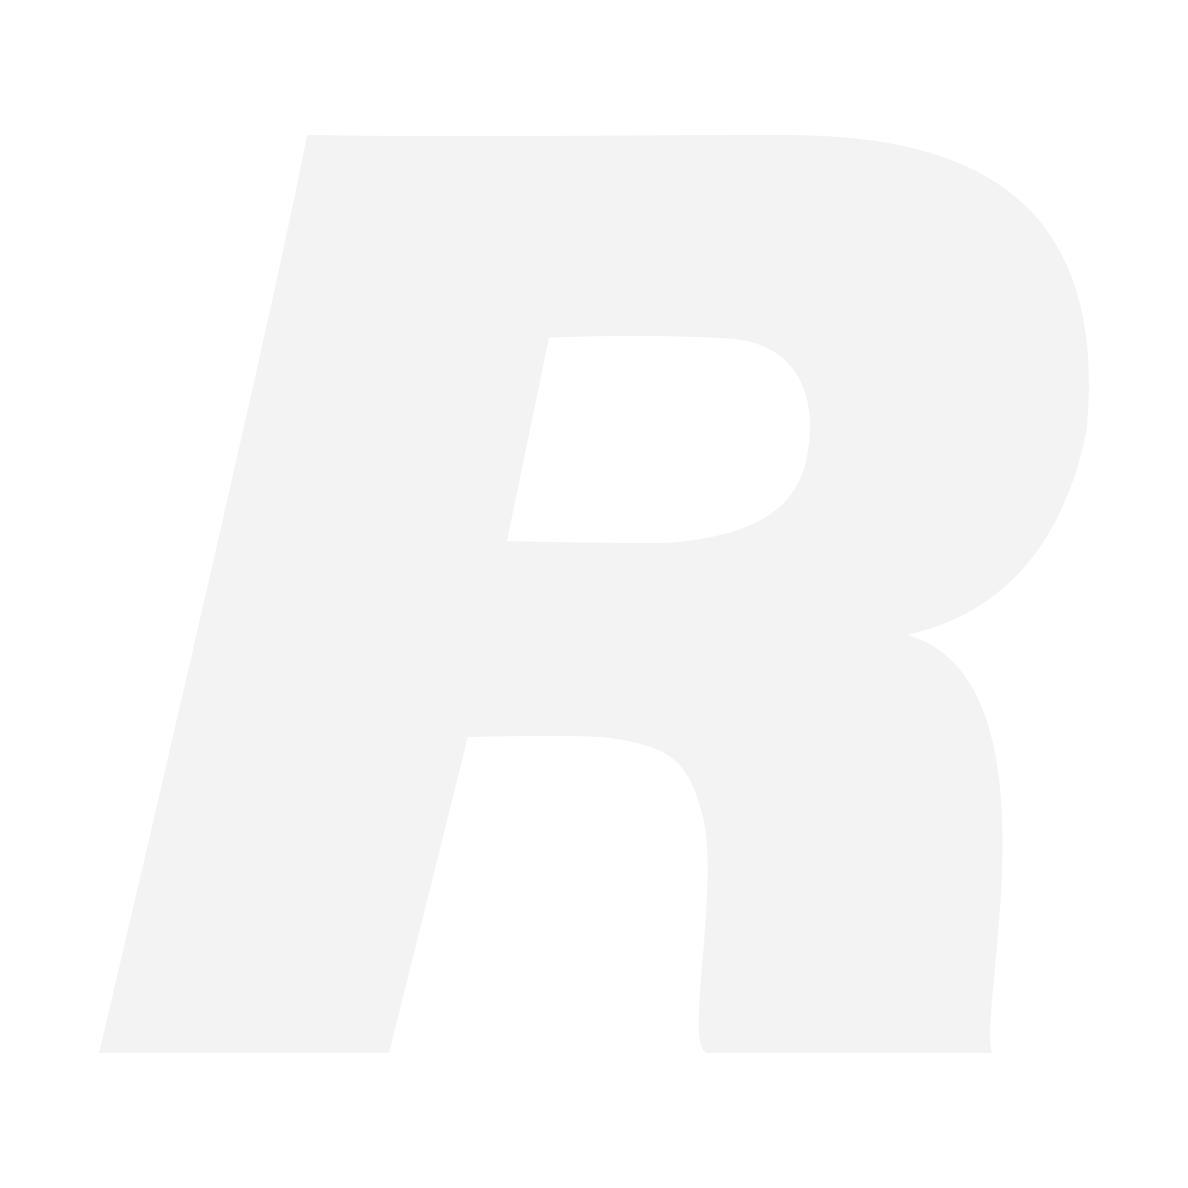 RICOH P10 28-300/3.5-5.6 VC KÄYTETTY